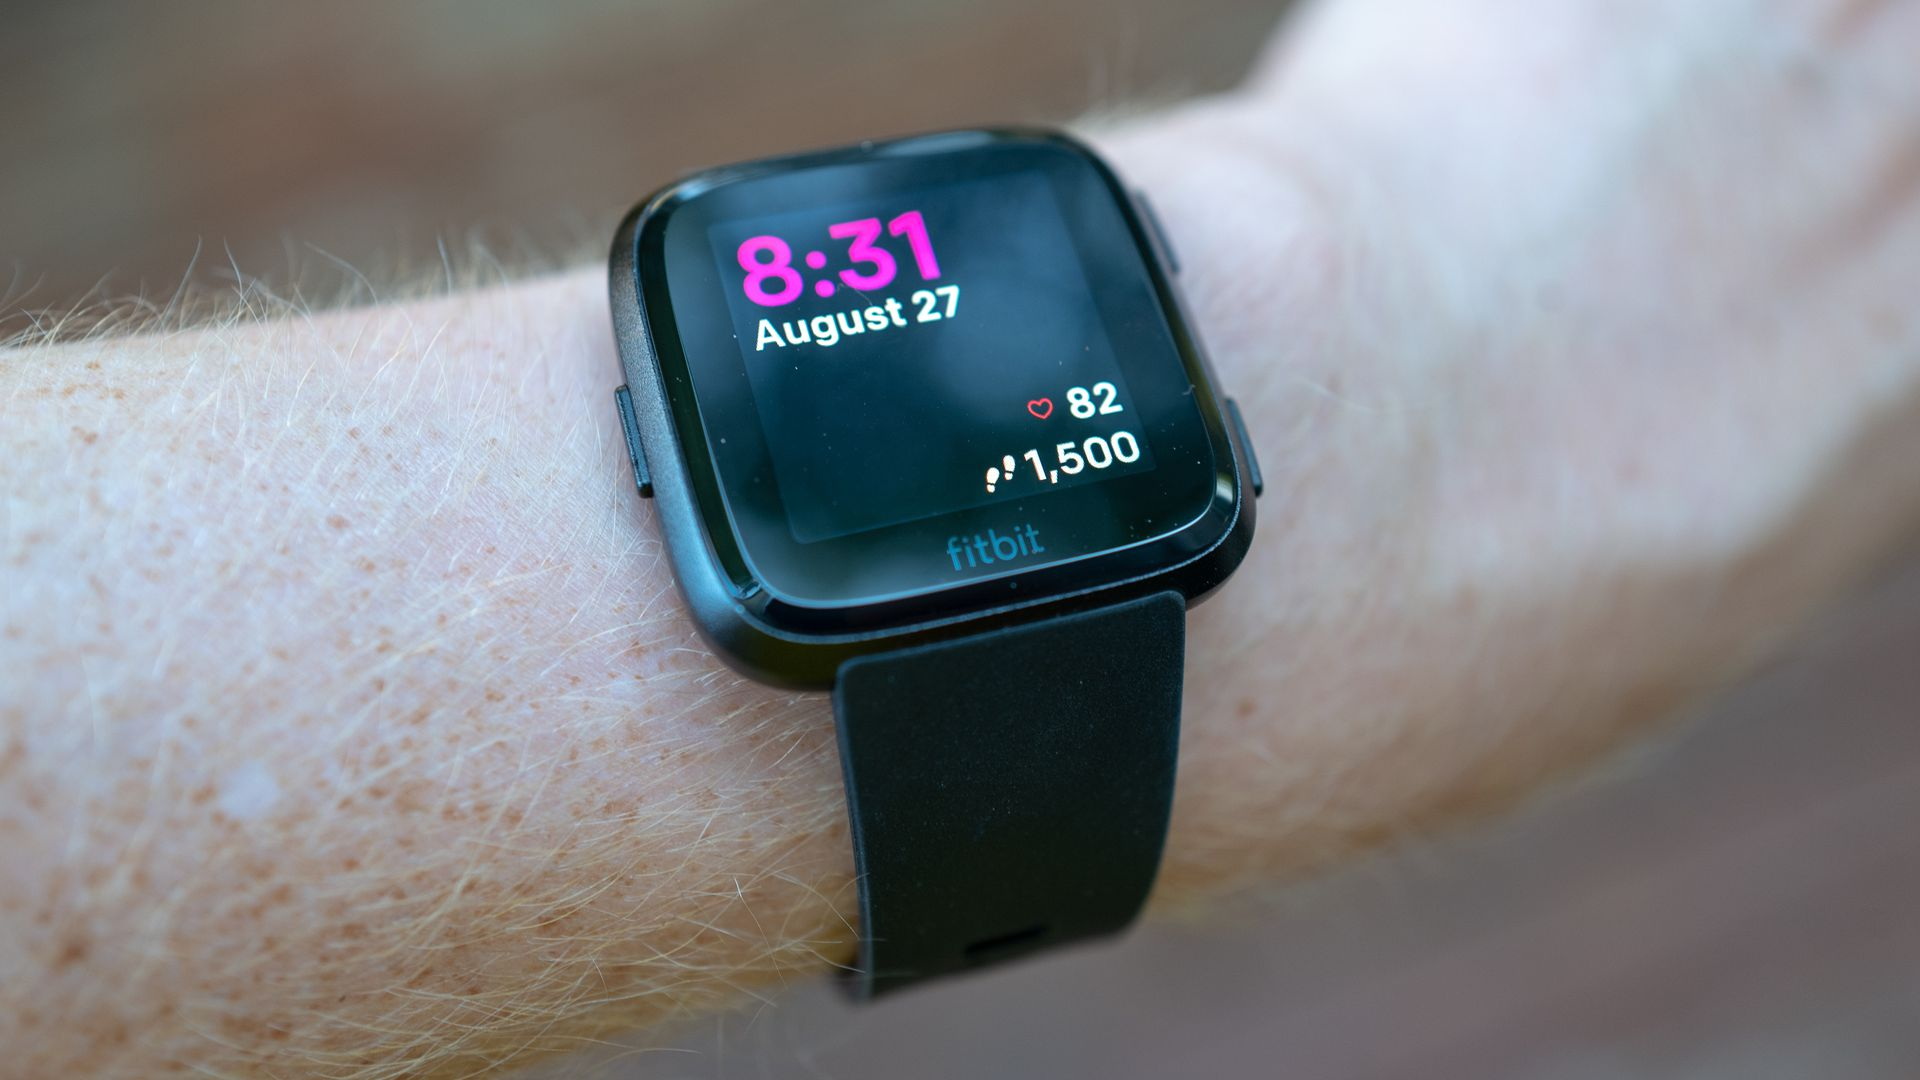 The Fitbit Versa smart watch.